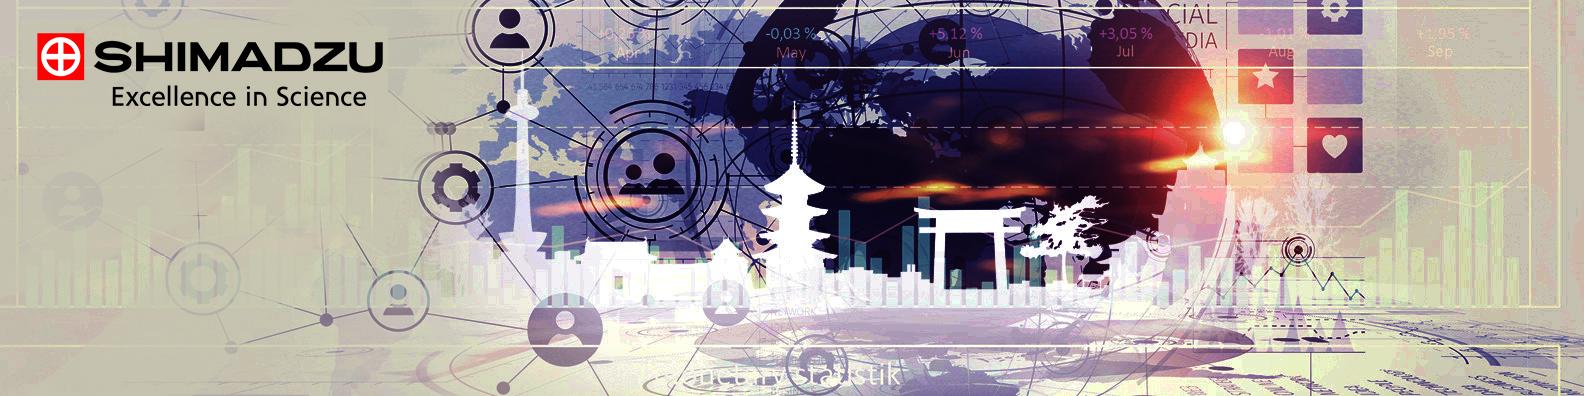 Shimadzu Learning Portal.jpg